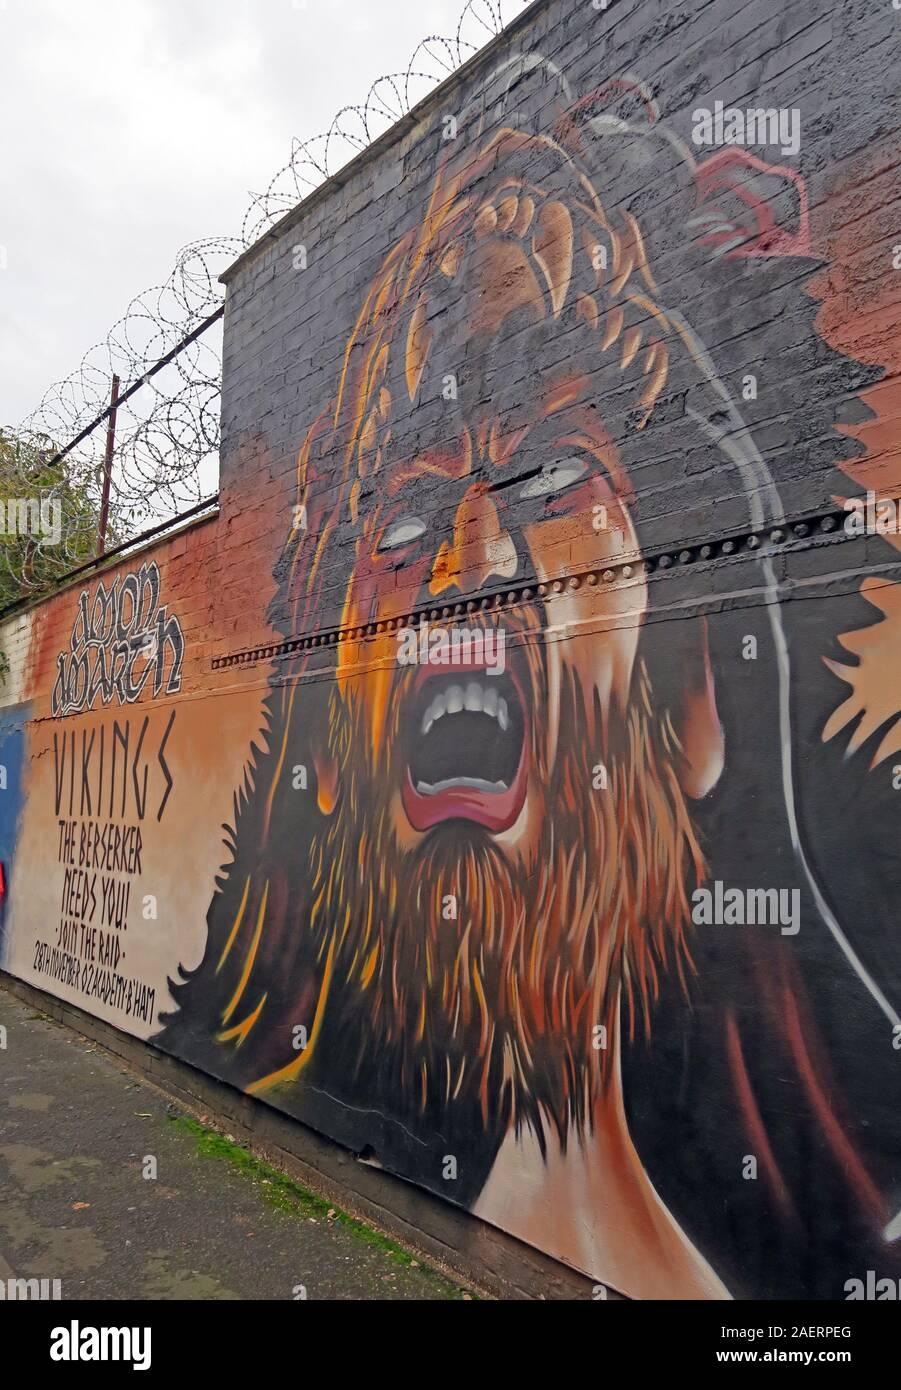 @HotpixUK,Hotpixuk,GoTonySmith,B5,Graffiti urban street art,in Floodgate St,Bordesley & Highgate,Birmingham,West Midlands,England,UK,B5 5ST,Floodgate St,Graffiti,street,artist,tag,tagged,Deritend,painted,bring,head,face,viking,wall